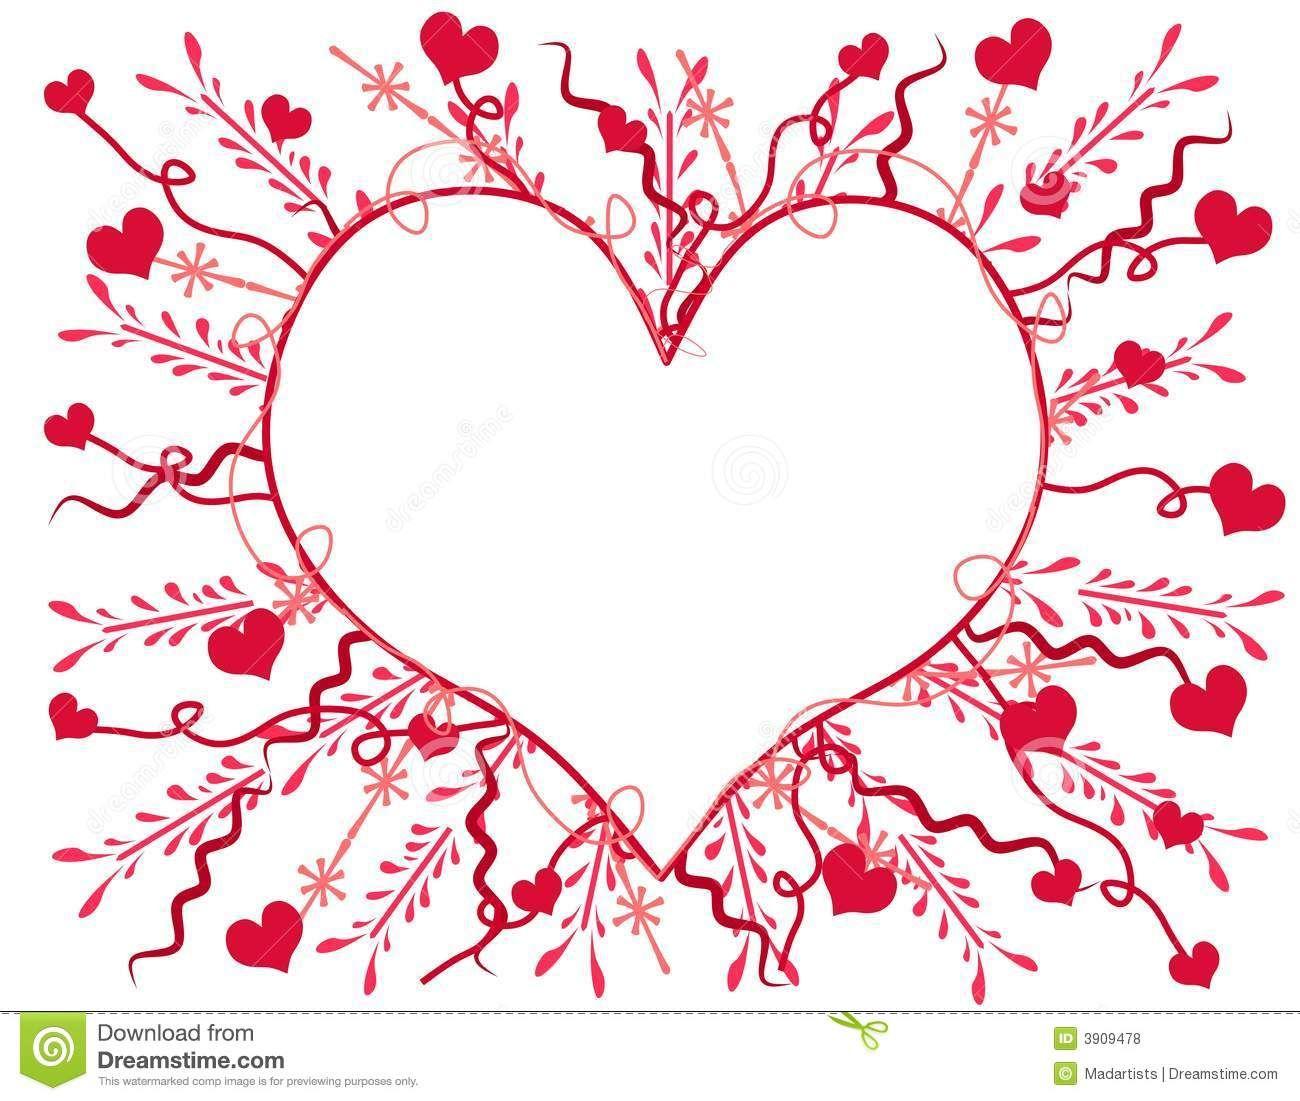 Valentines day heart whatsapp dp Valentines day, love, hd ...